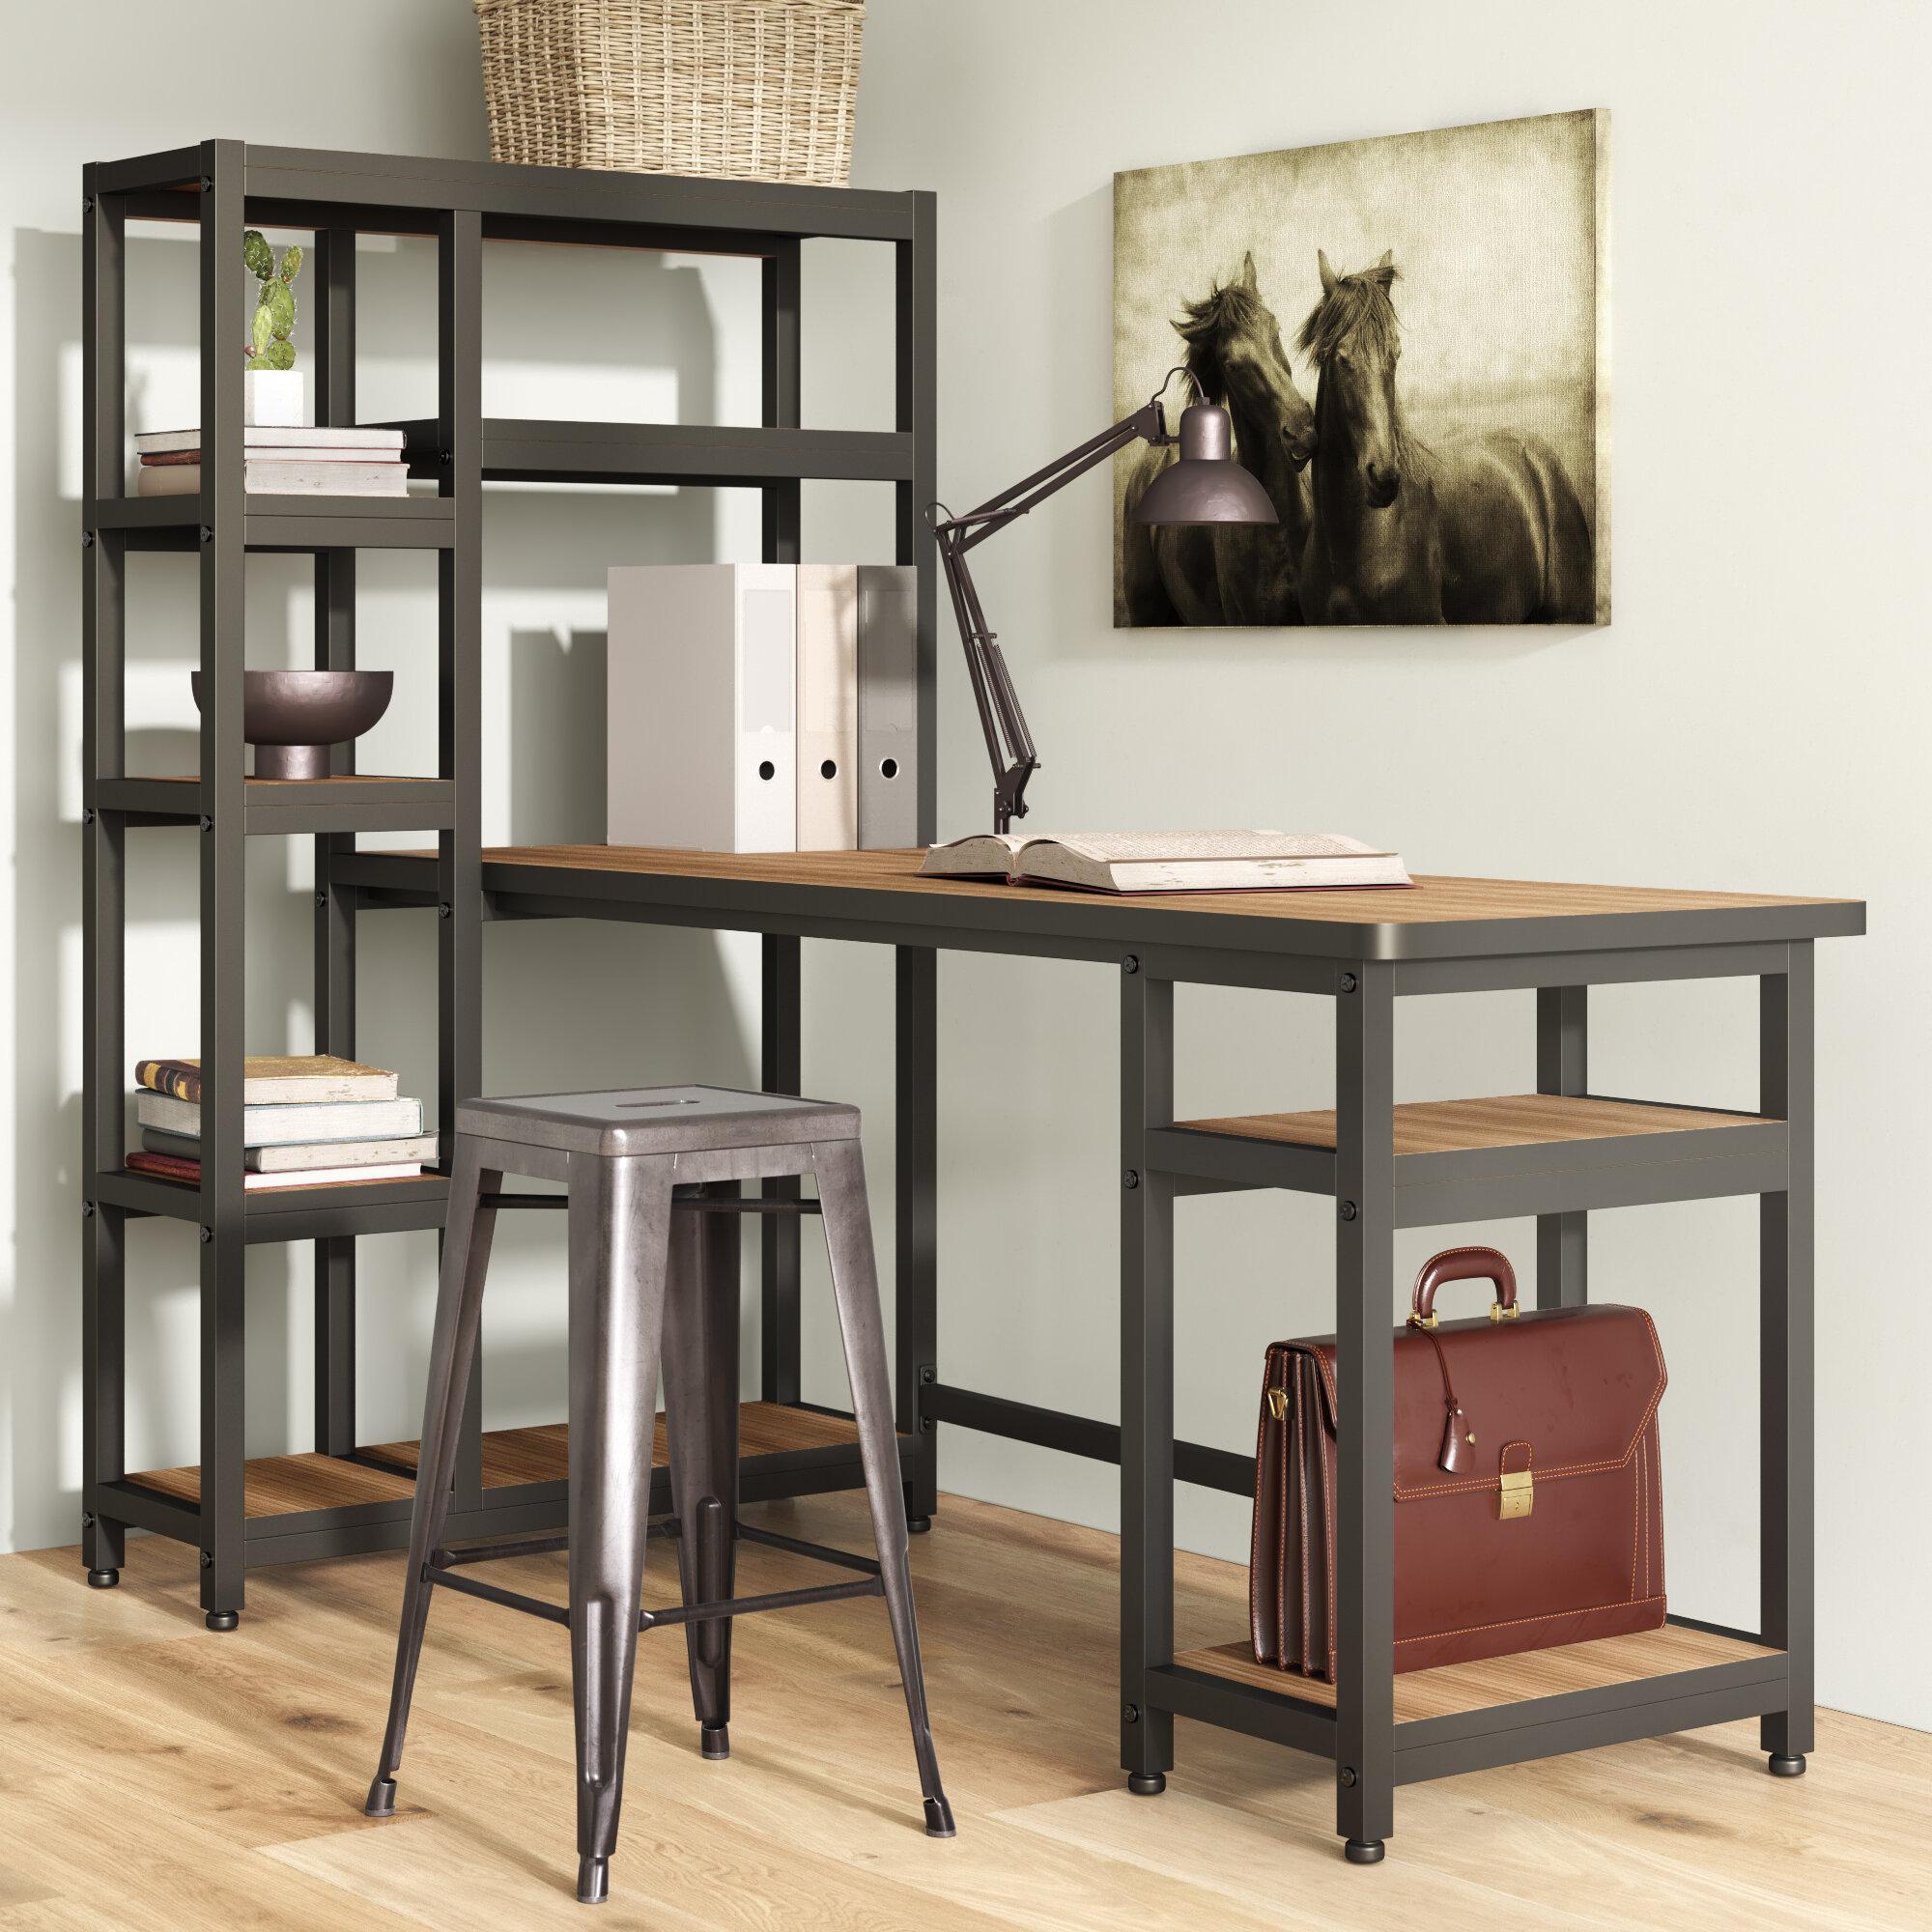 Hutch Light Wood Desks You'll Love in 10   Wayfair